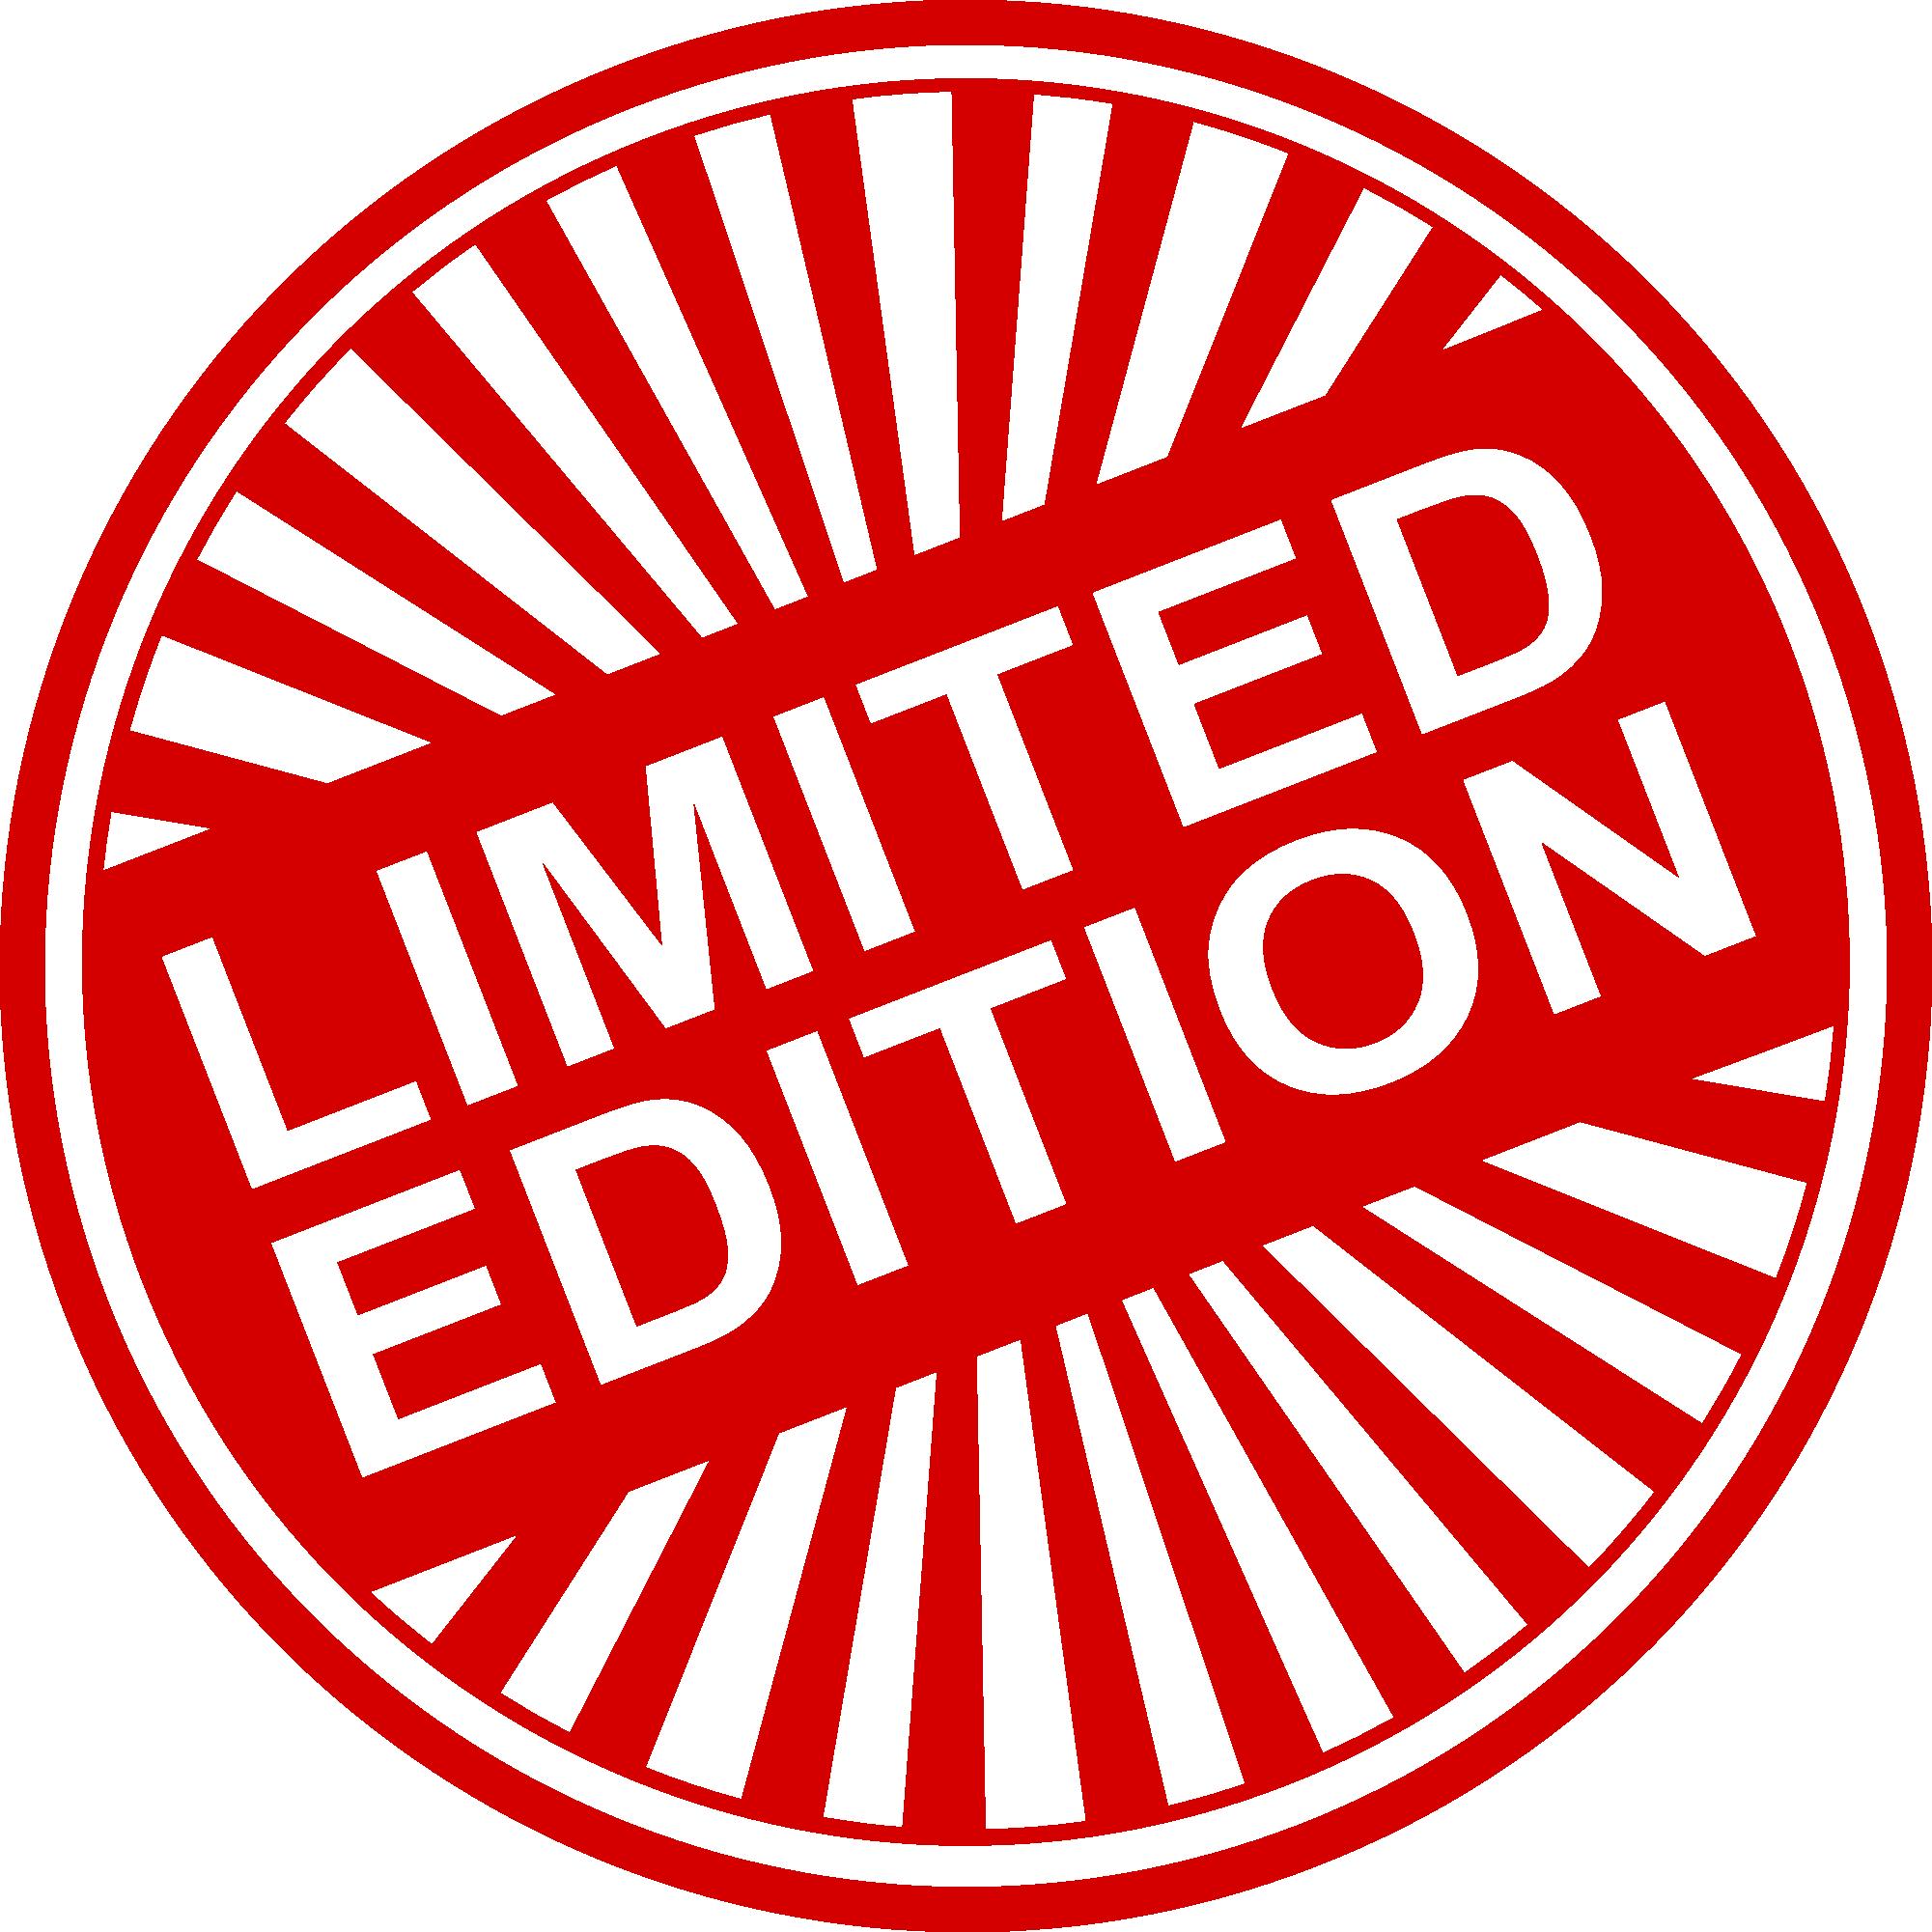 4 Limited Edition Stamp Vector (PNG Transparent, SVG).